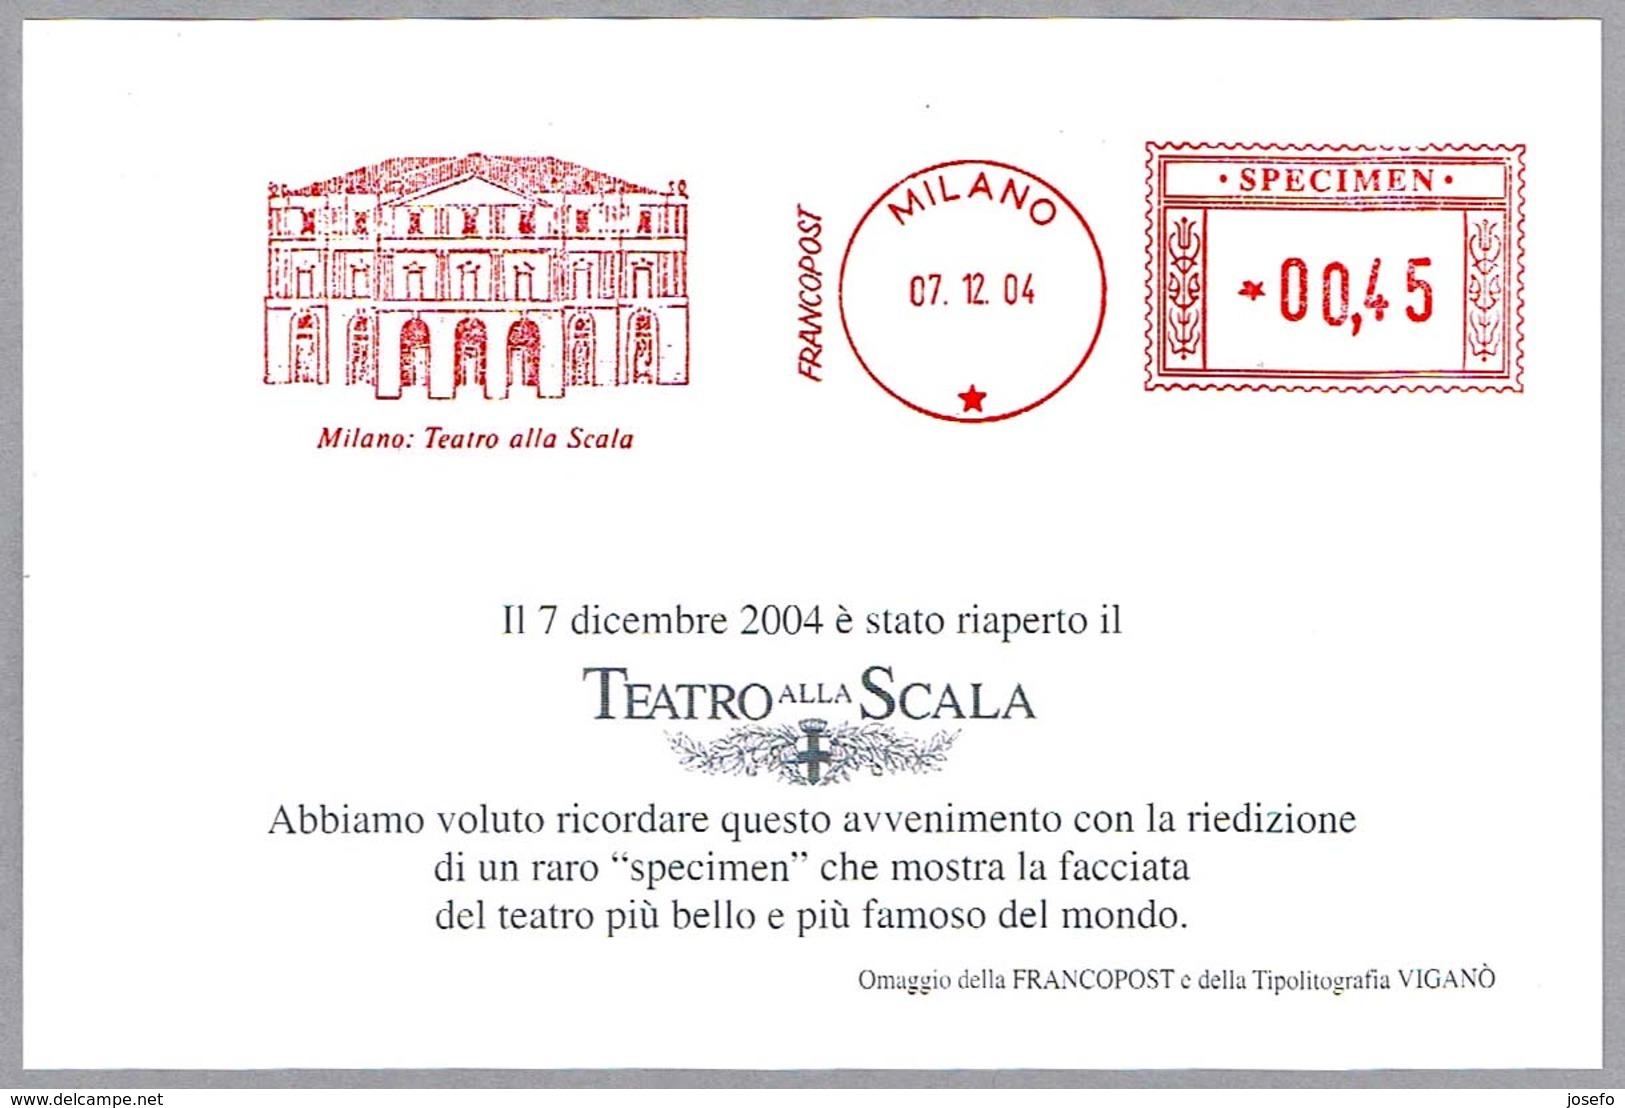 Franqueo Mecanico MILANO: TEATRO ALLA SCALA - SPECIMEN. Milano 2004 - Teatro